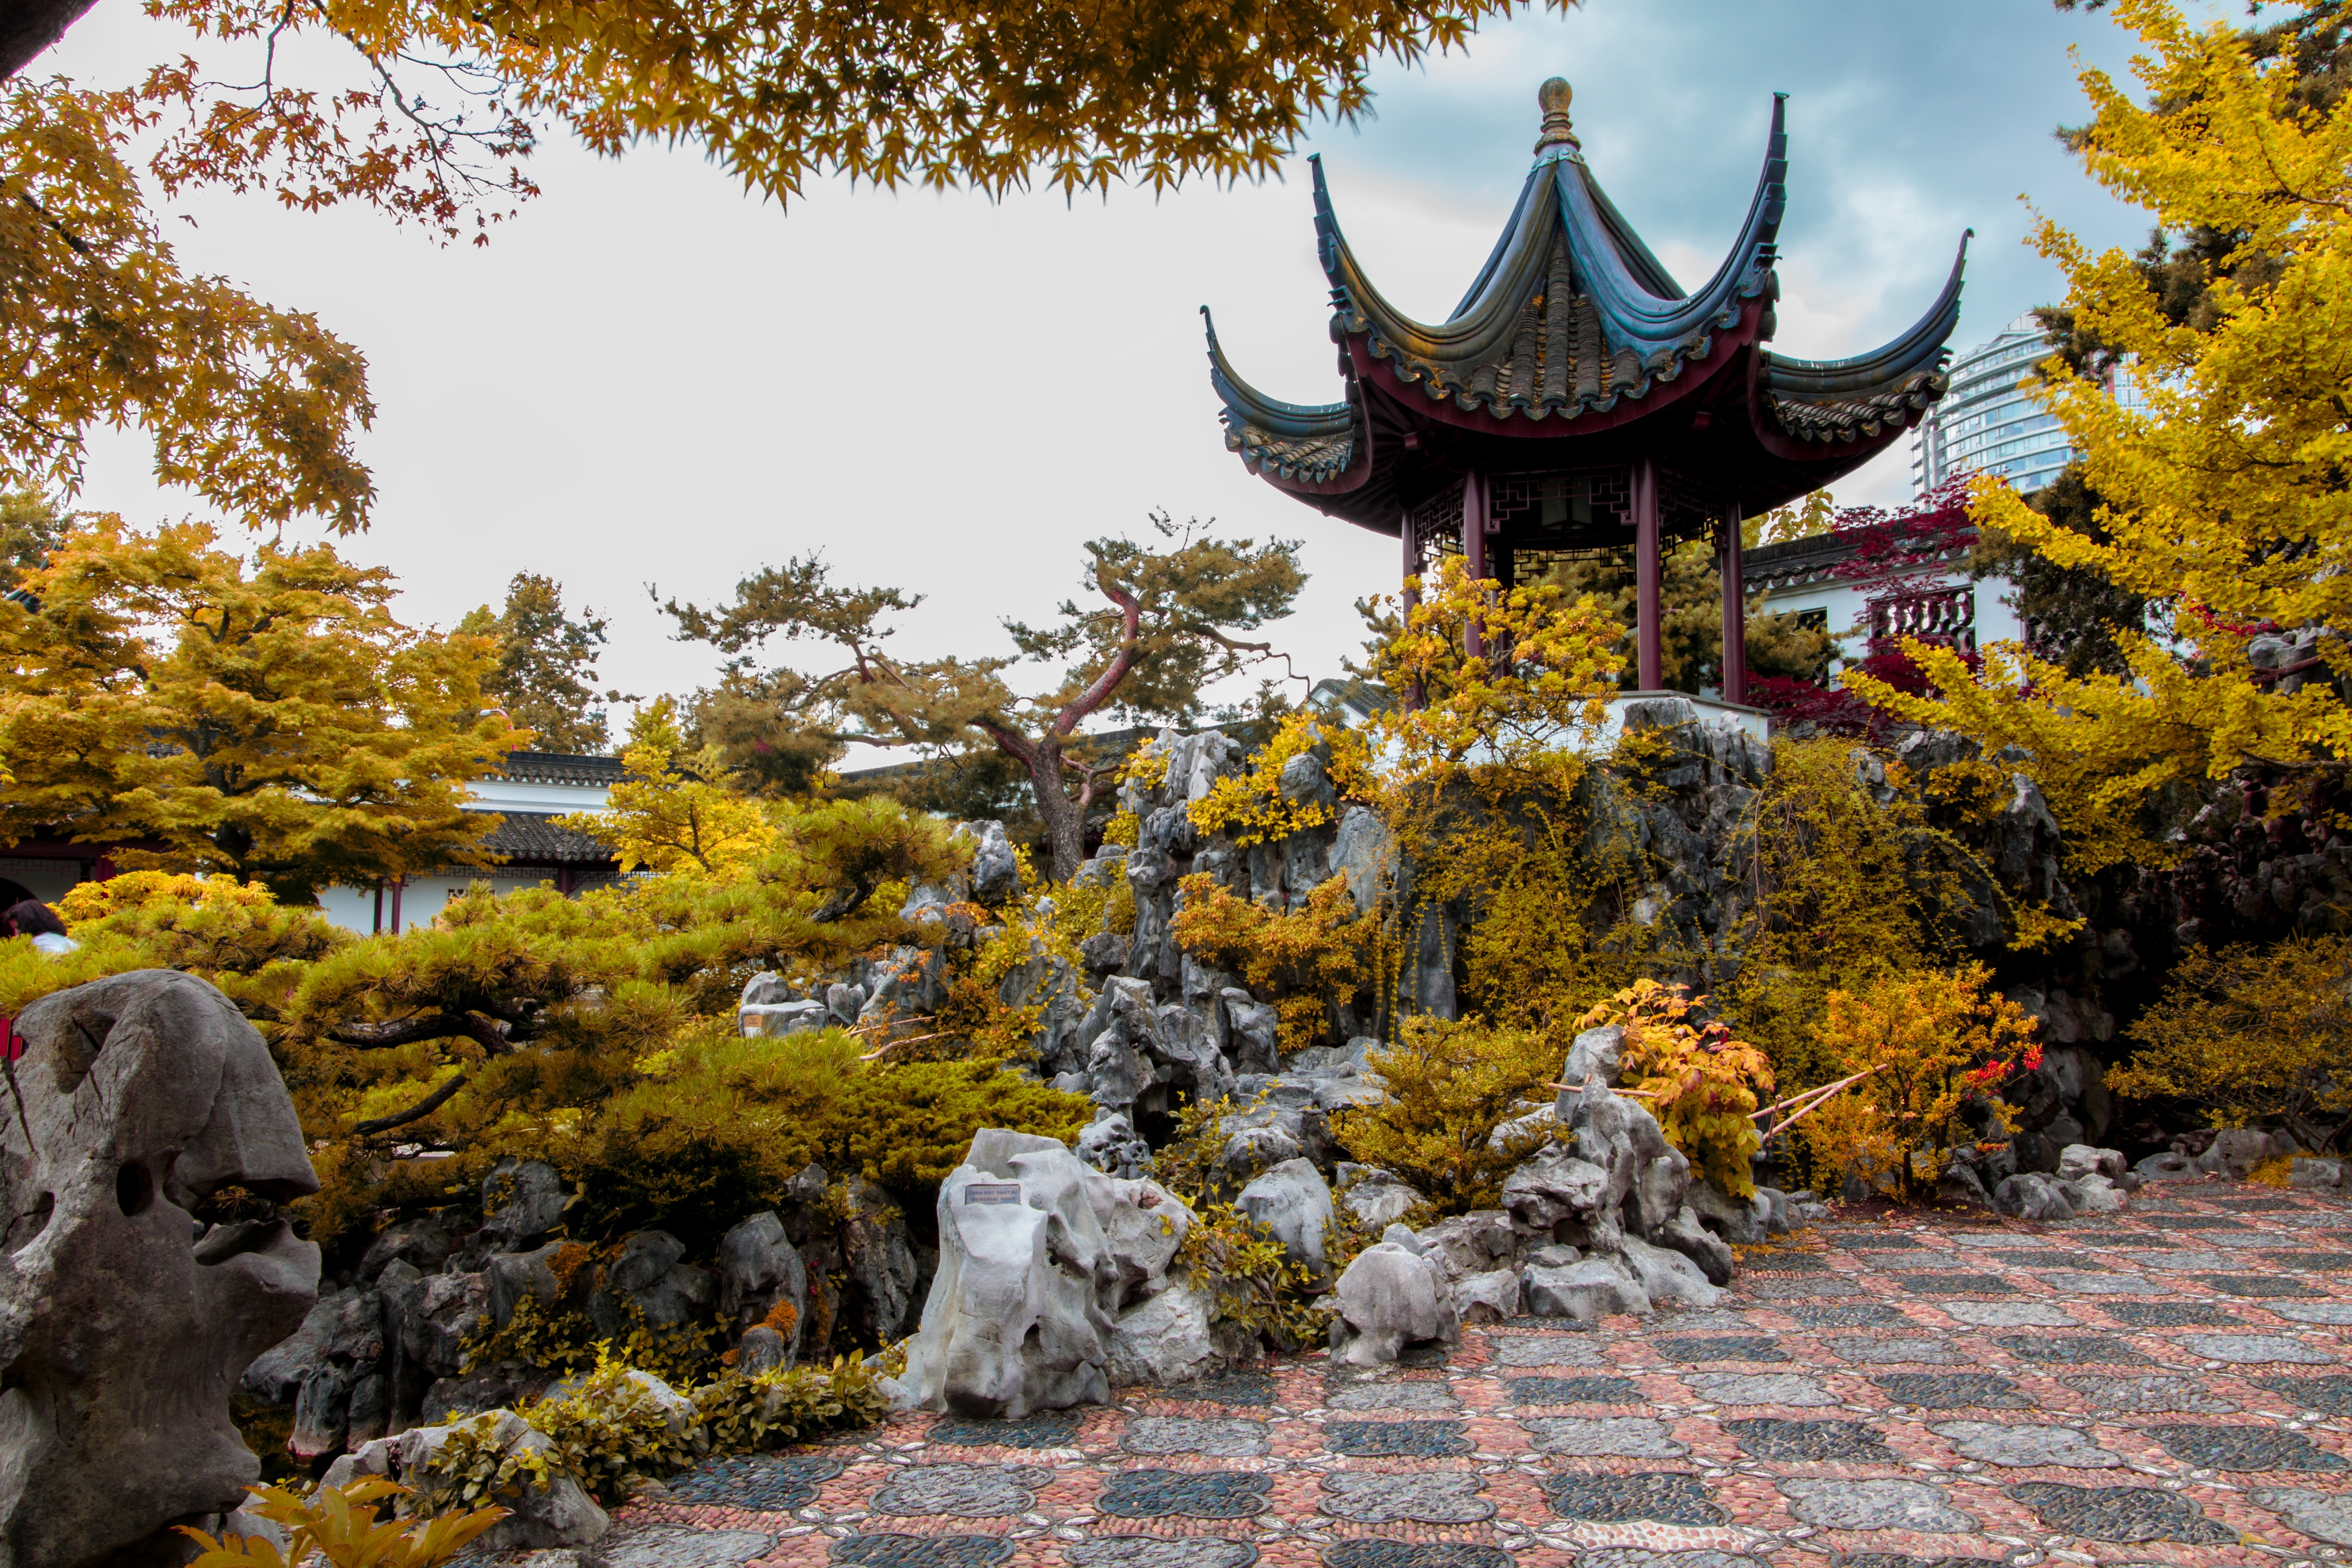 Dr Sun Yat-Sen Classical Chinese Garden & Park - Lonely Planet